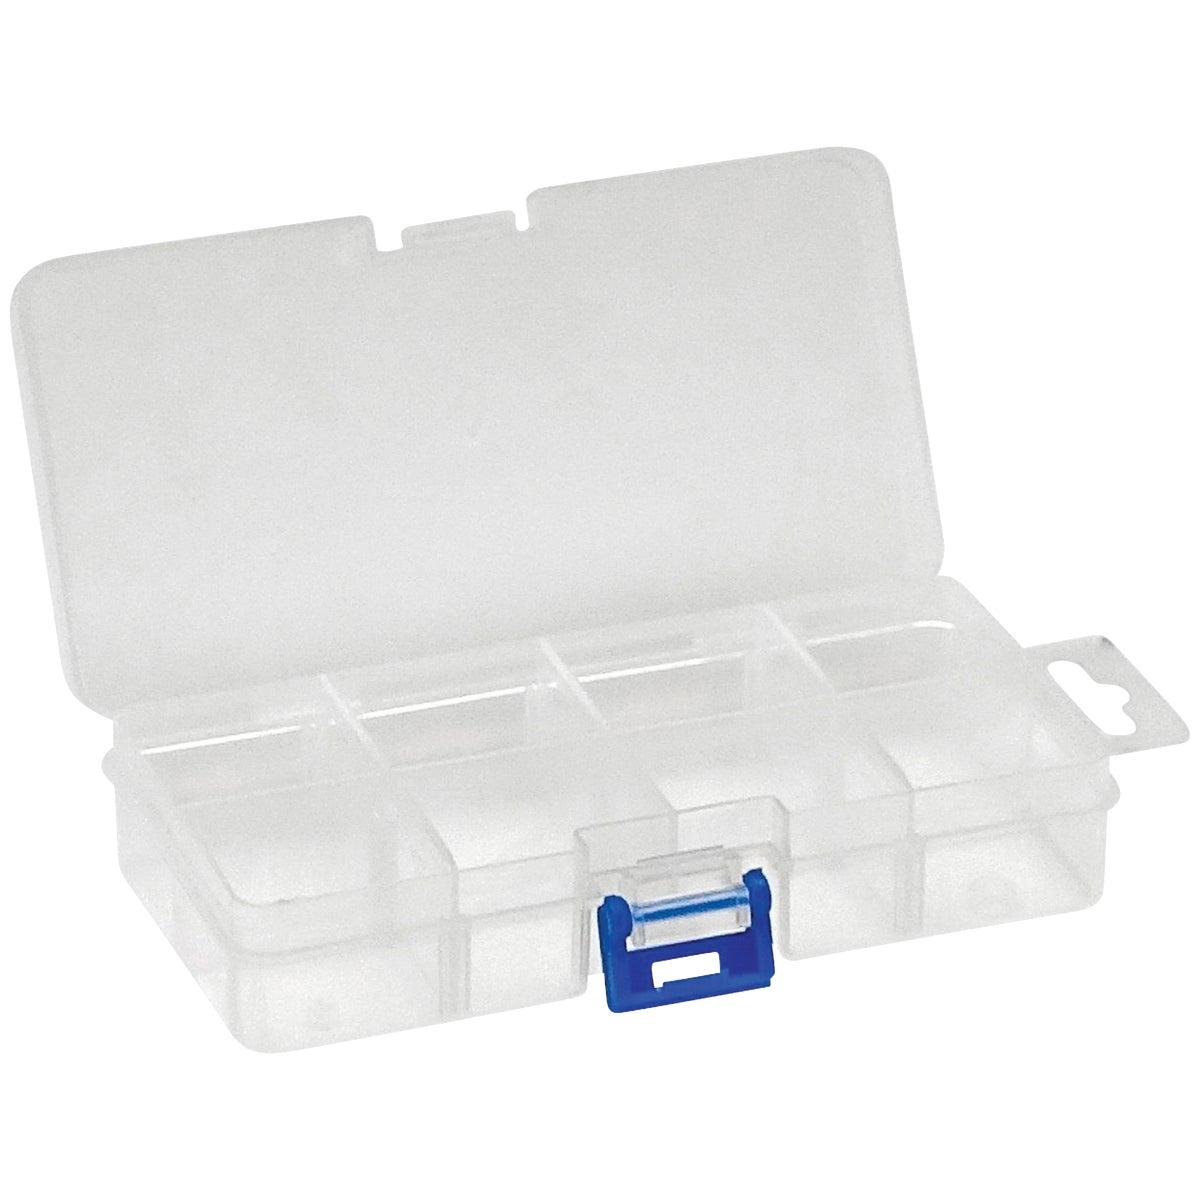 Plano POCKET UTILITY BOX 3448-60